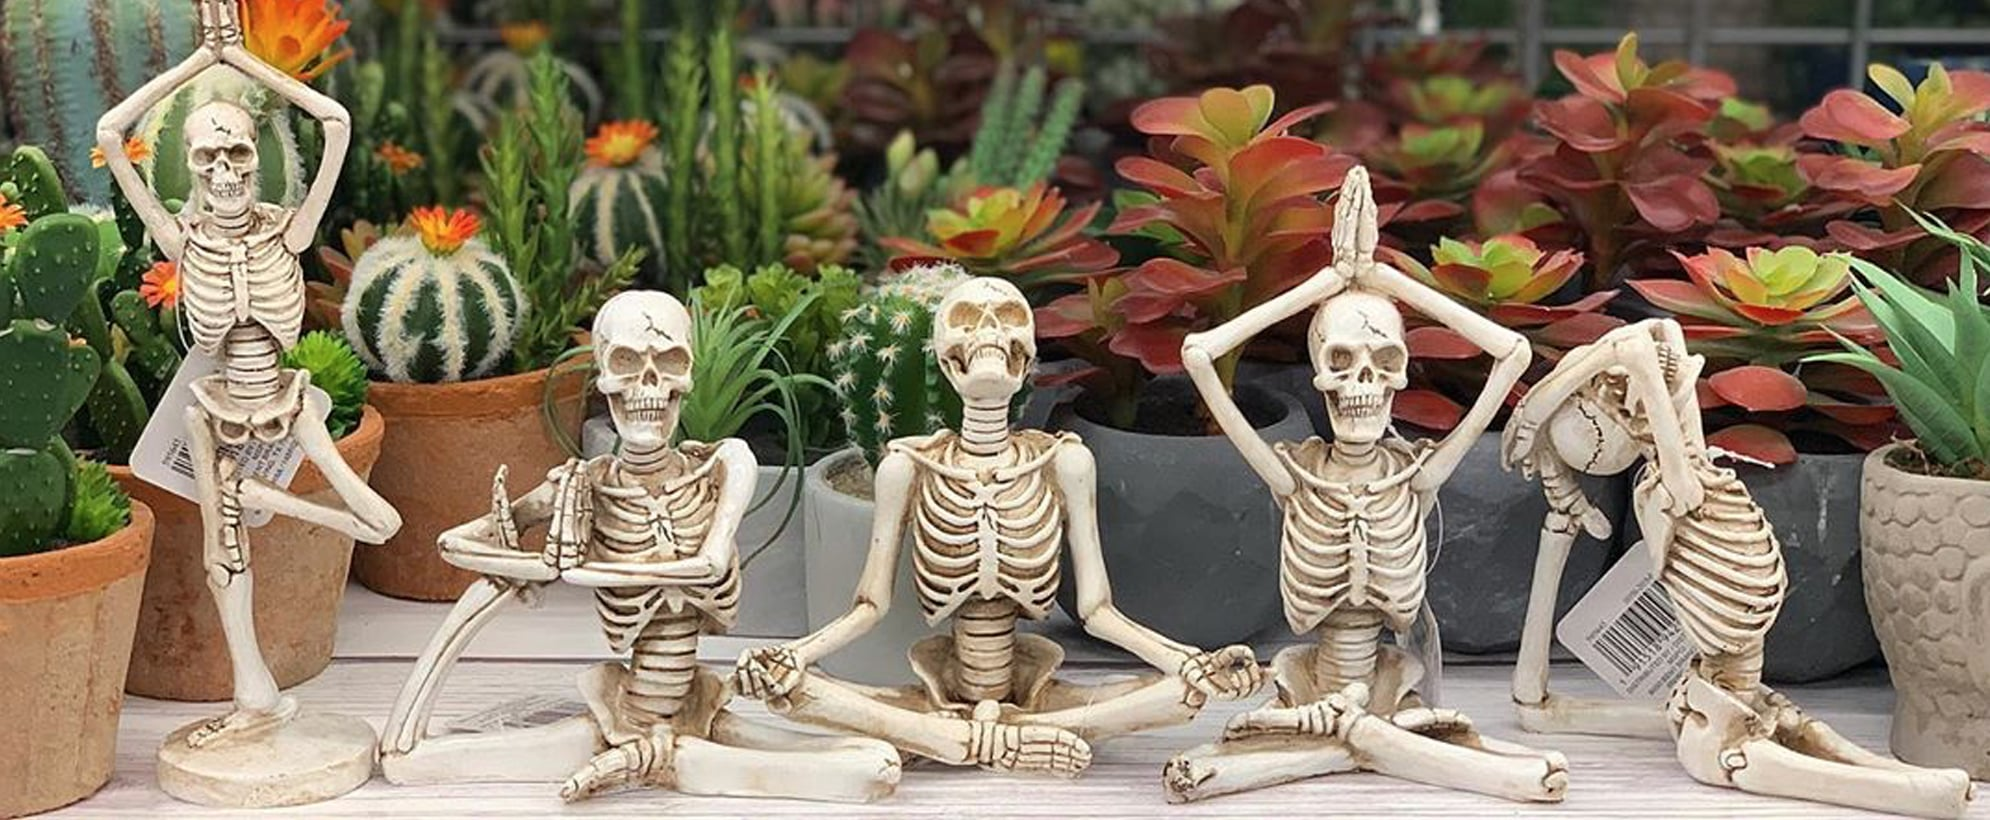 Yoga Skeletons at Michaels For Halloween